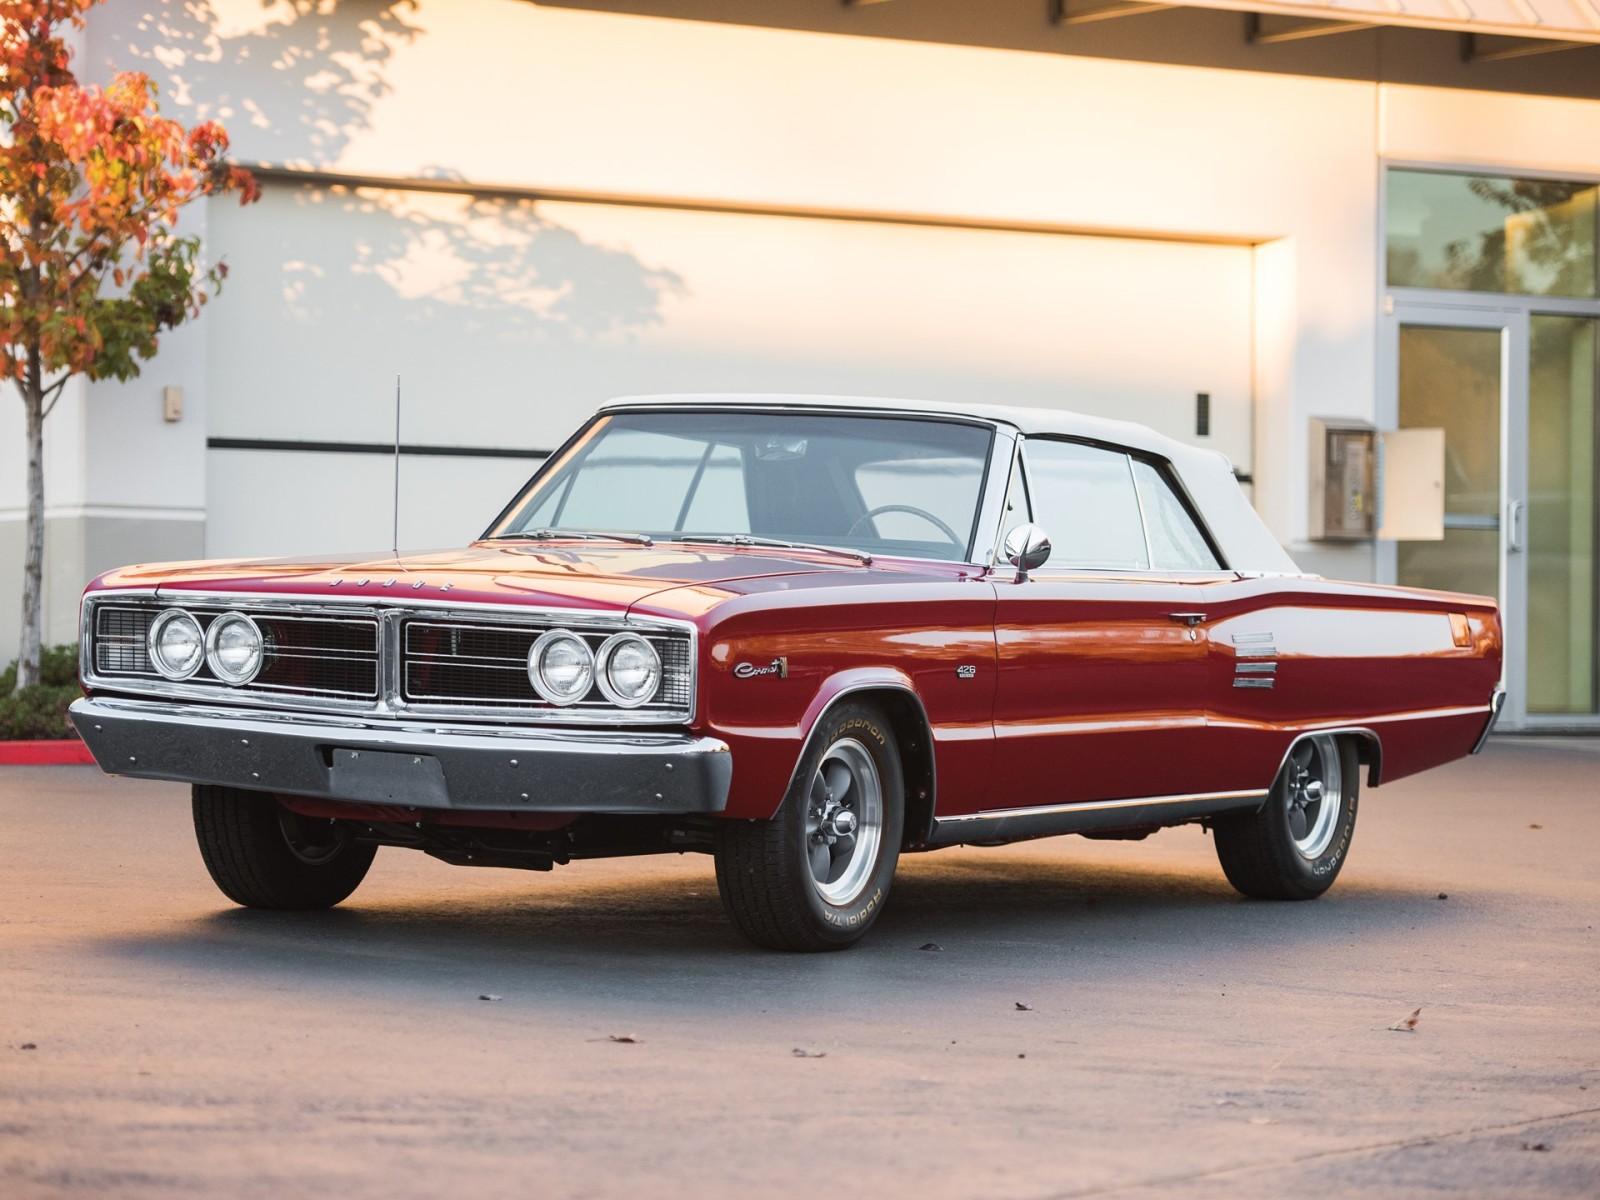 1966 Dodge Coronet 500 Hemi Convertible